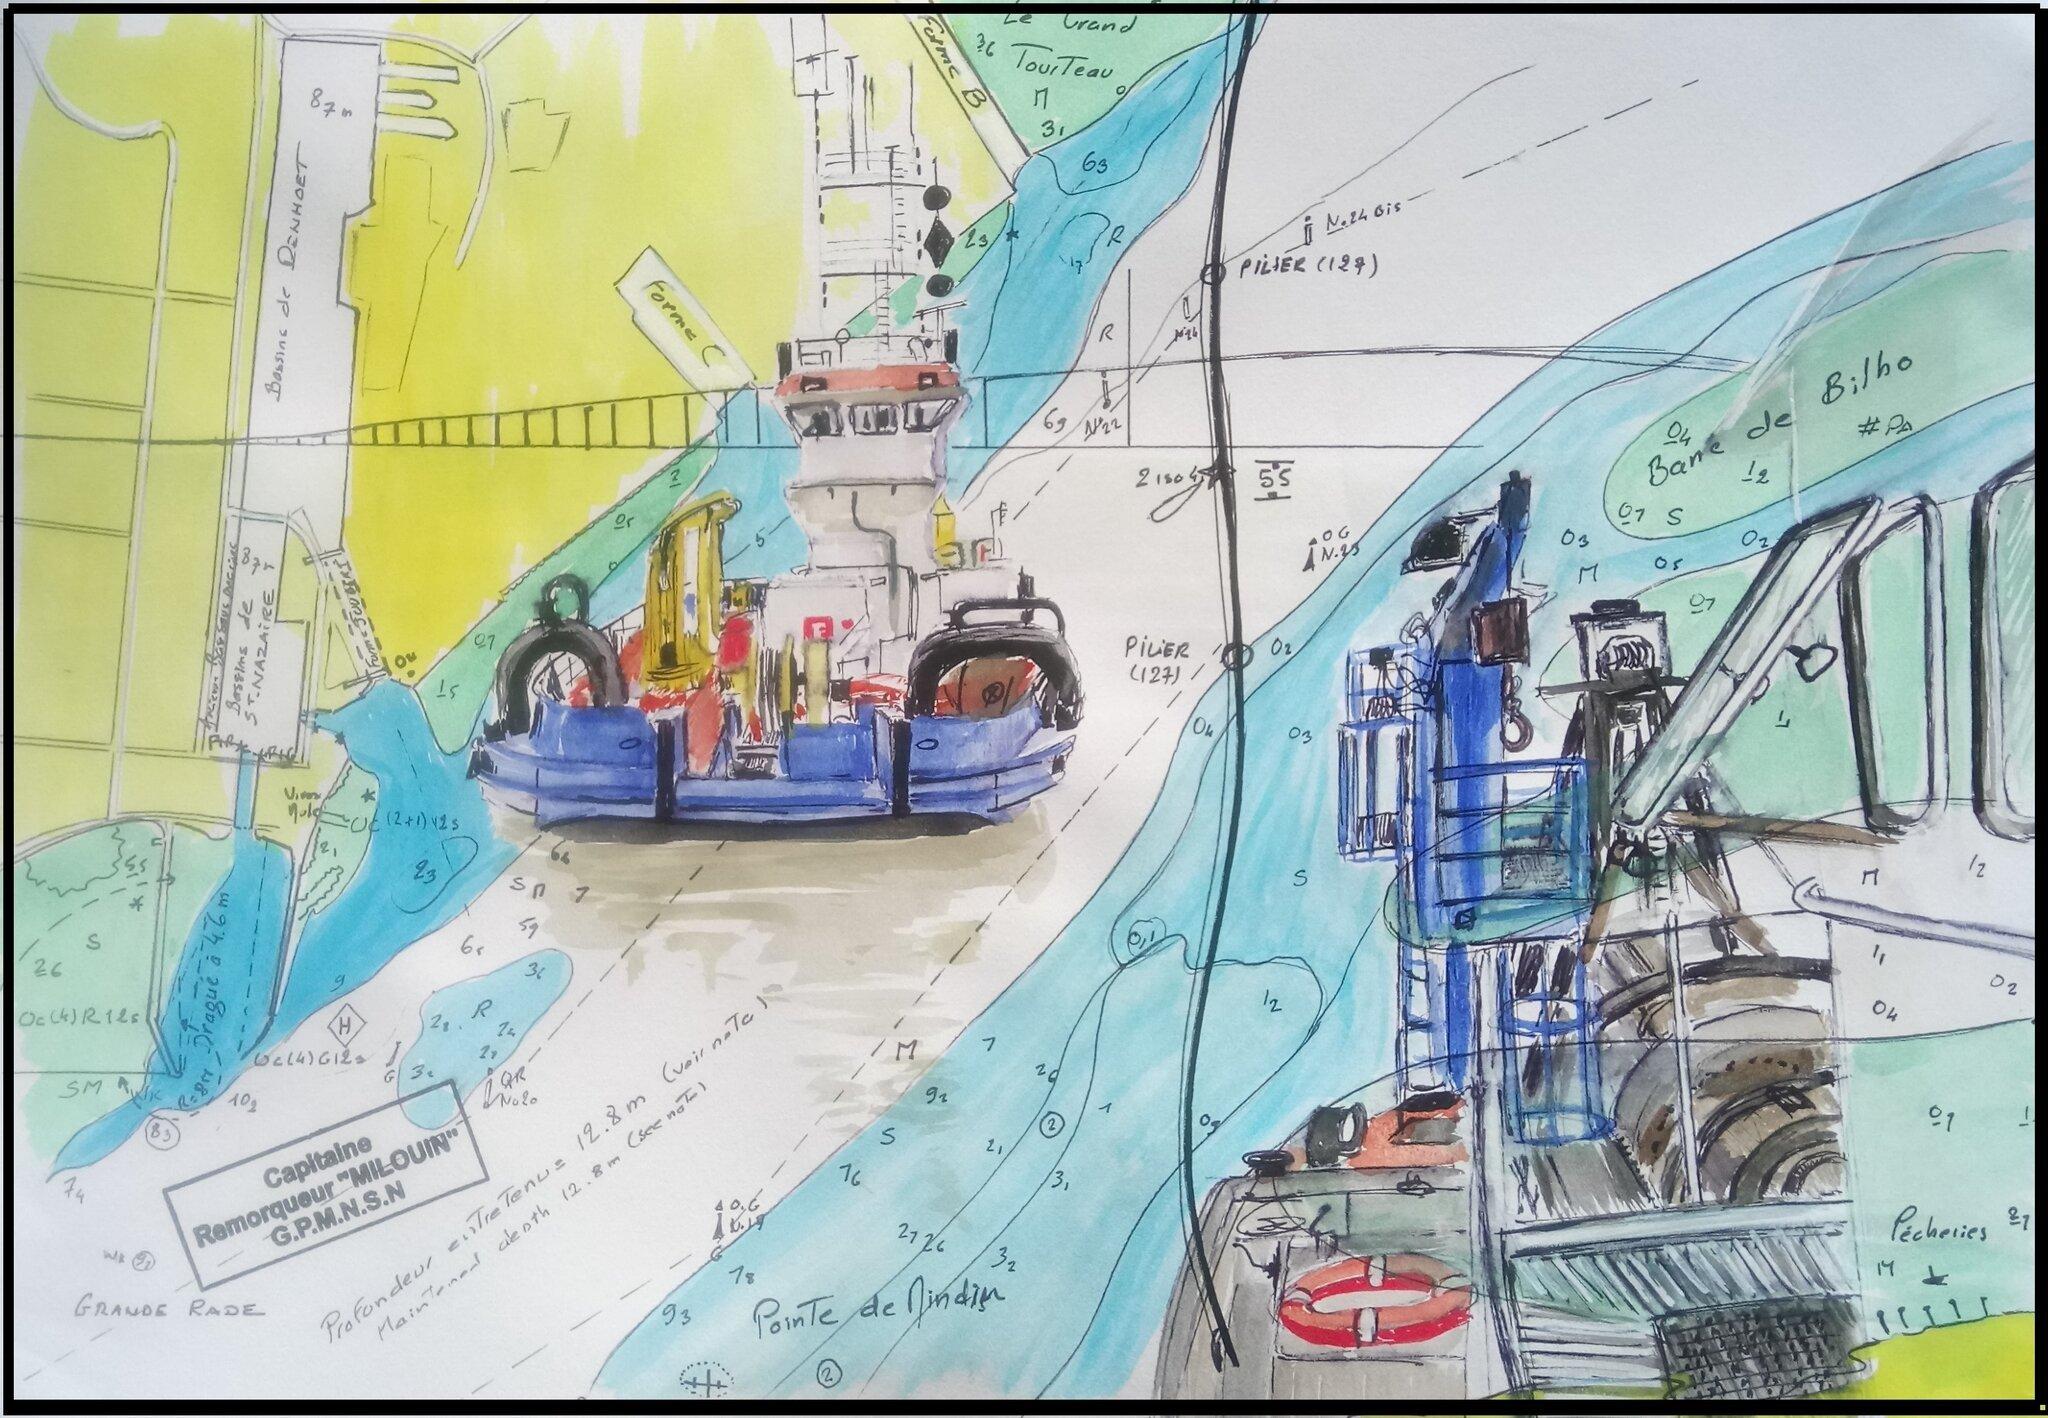 Aquarell 210 x 300 - Tug MILOUIN approaching dredger ANDRE GENDRE - 2017